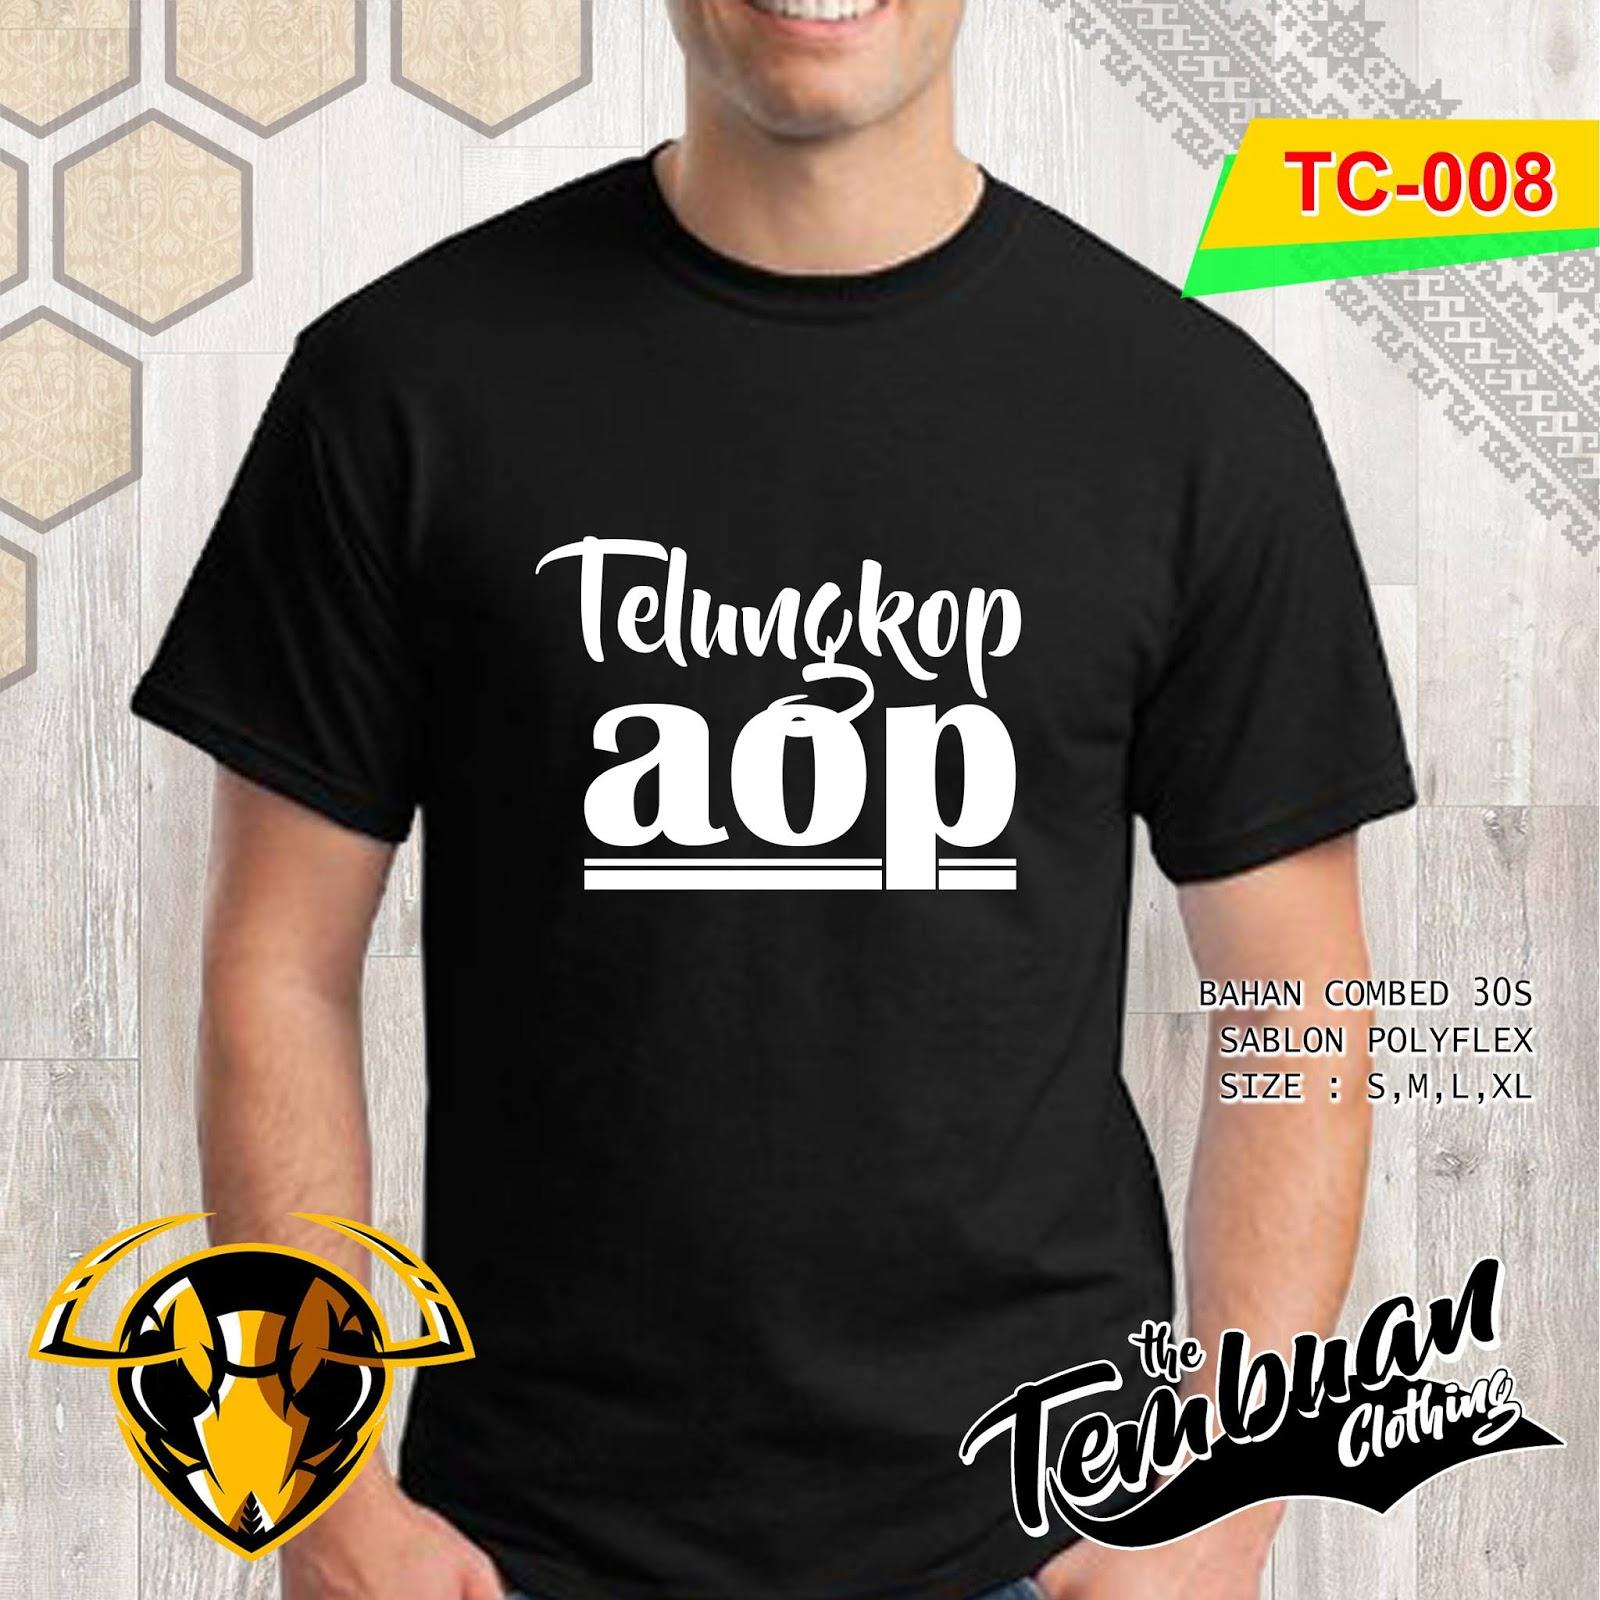 Tembuan Clothing - TC-008 (Telungkop Aop)